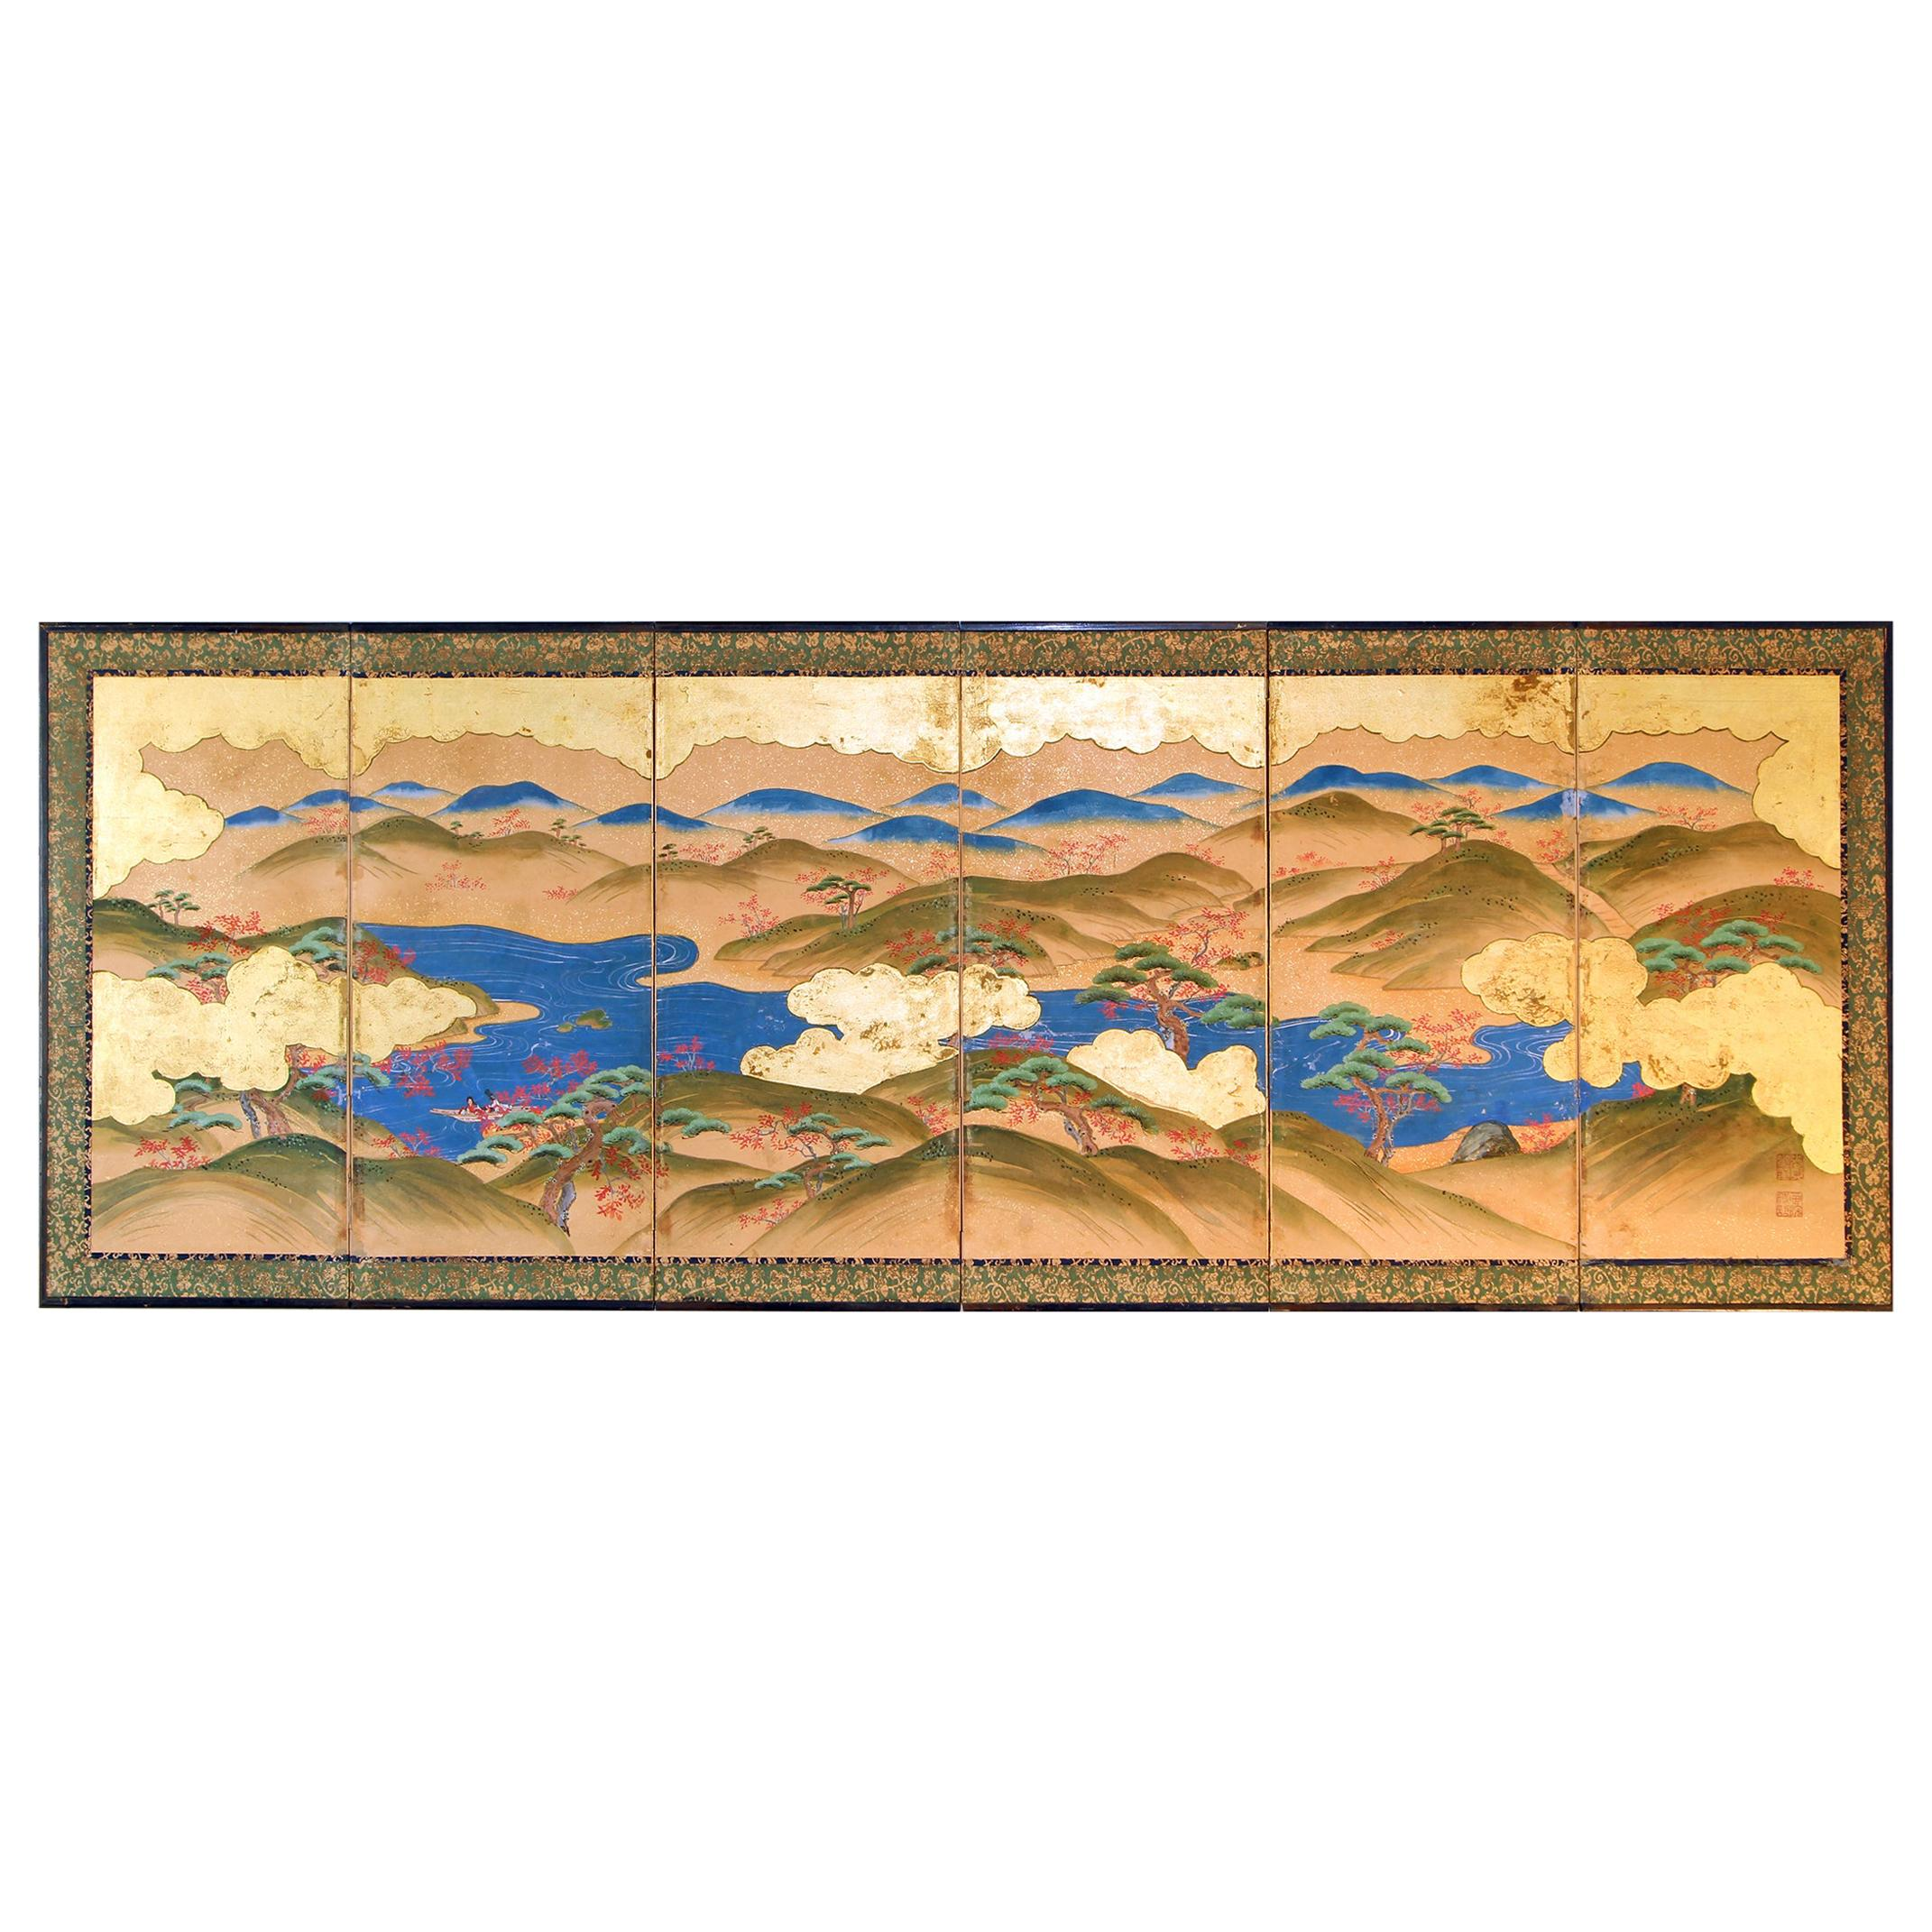 Japanese Landscape of the 19th Century, Small Six Folding Screen Kano School